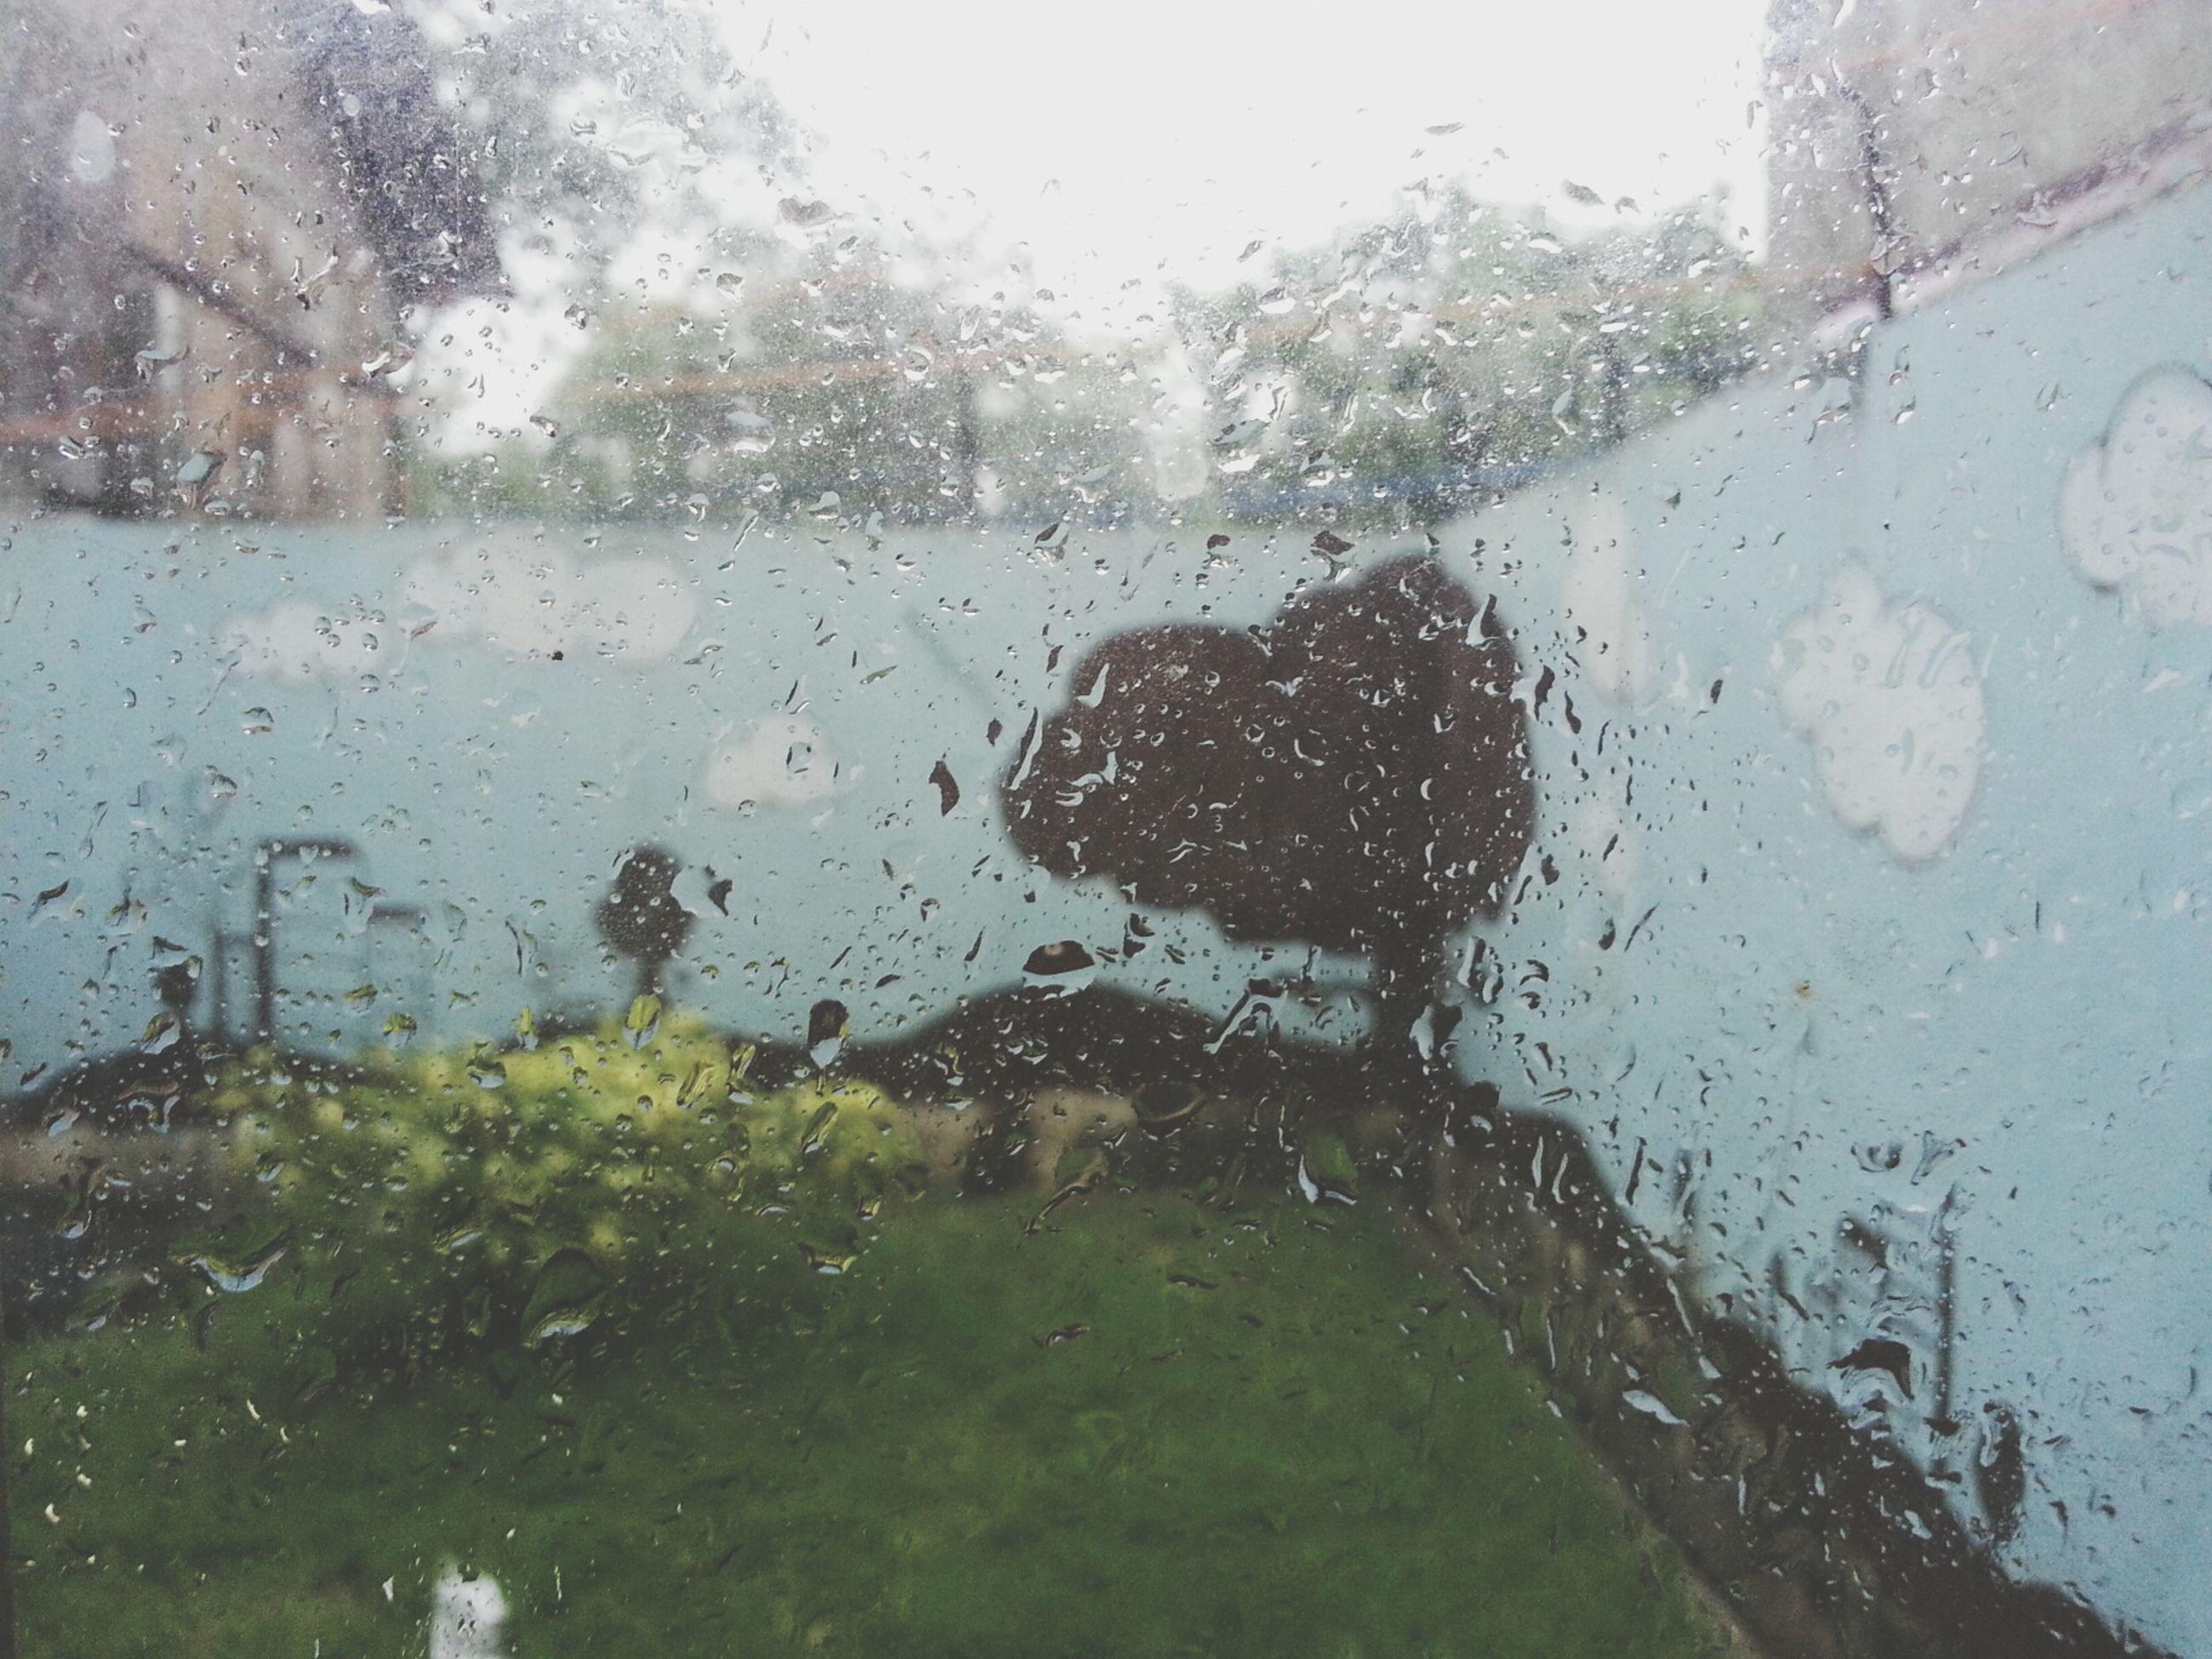 drop, wet, water, rain, window, transparent, glass - material, weather, season, raindrop, monsoon, indoors, rainy season, built structure, glass, tree, architecture, day, building exterior, sky